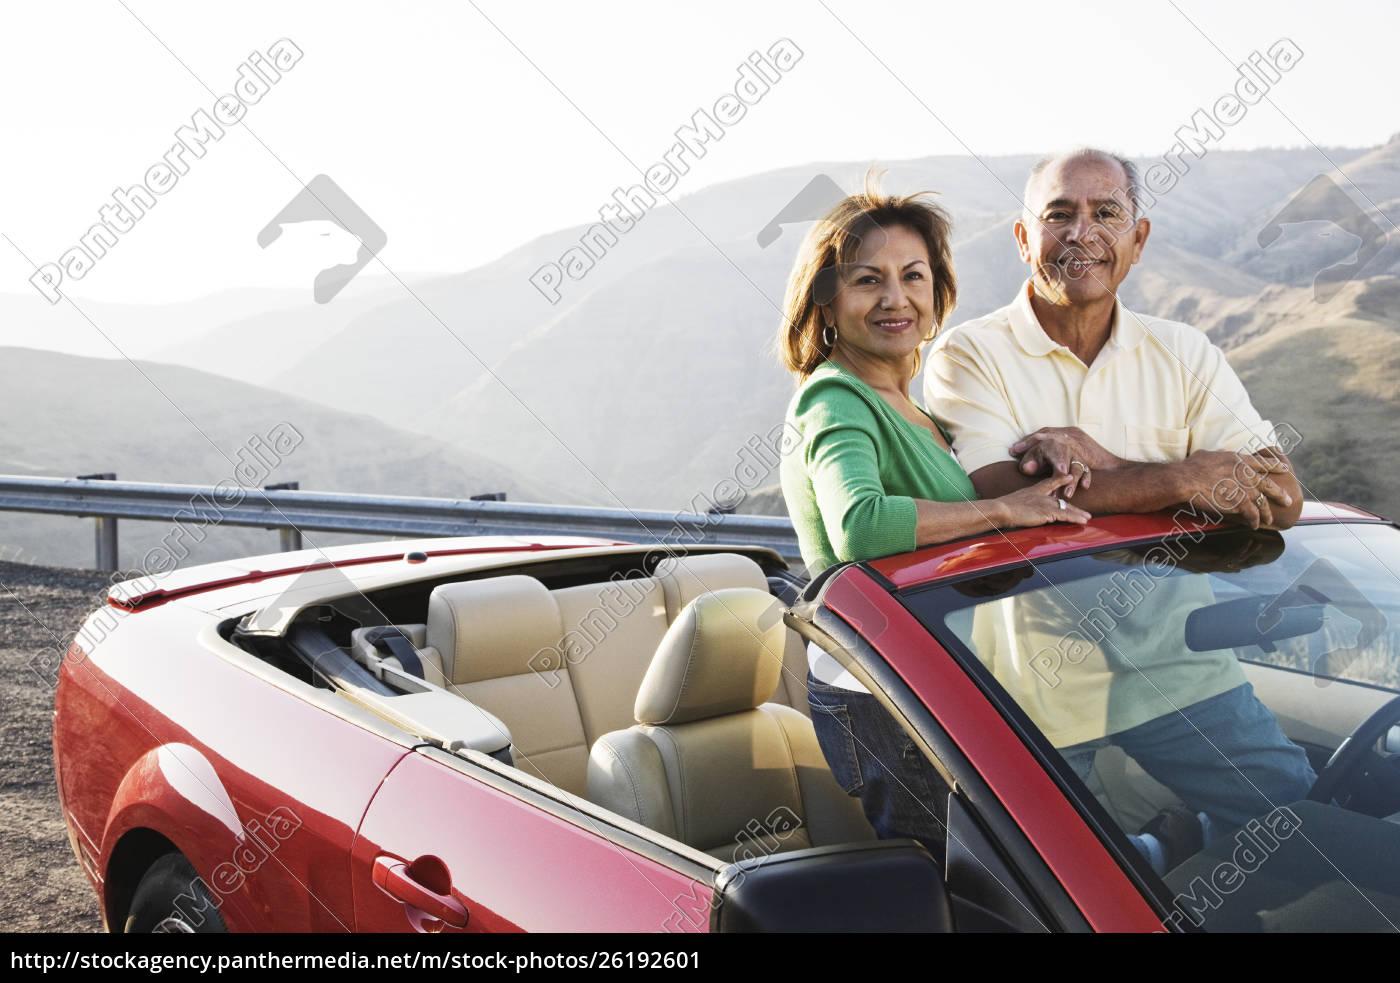 a, hip, senior, hispanic, couple, on - 26192601